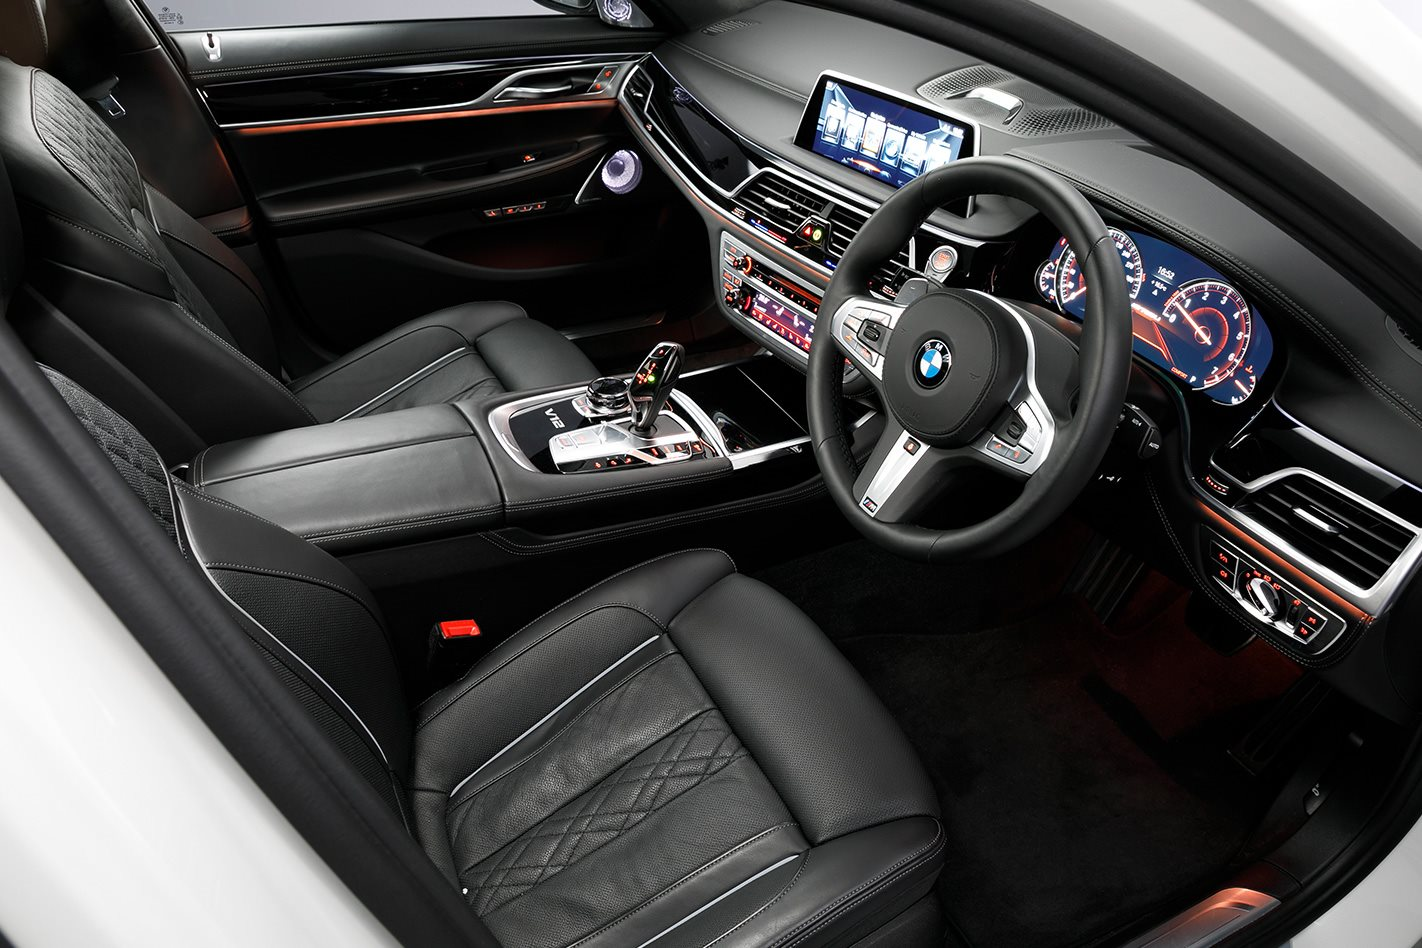 2017-BMW-M760Li-xDrive-interior.jpg